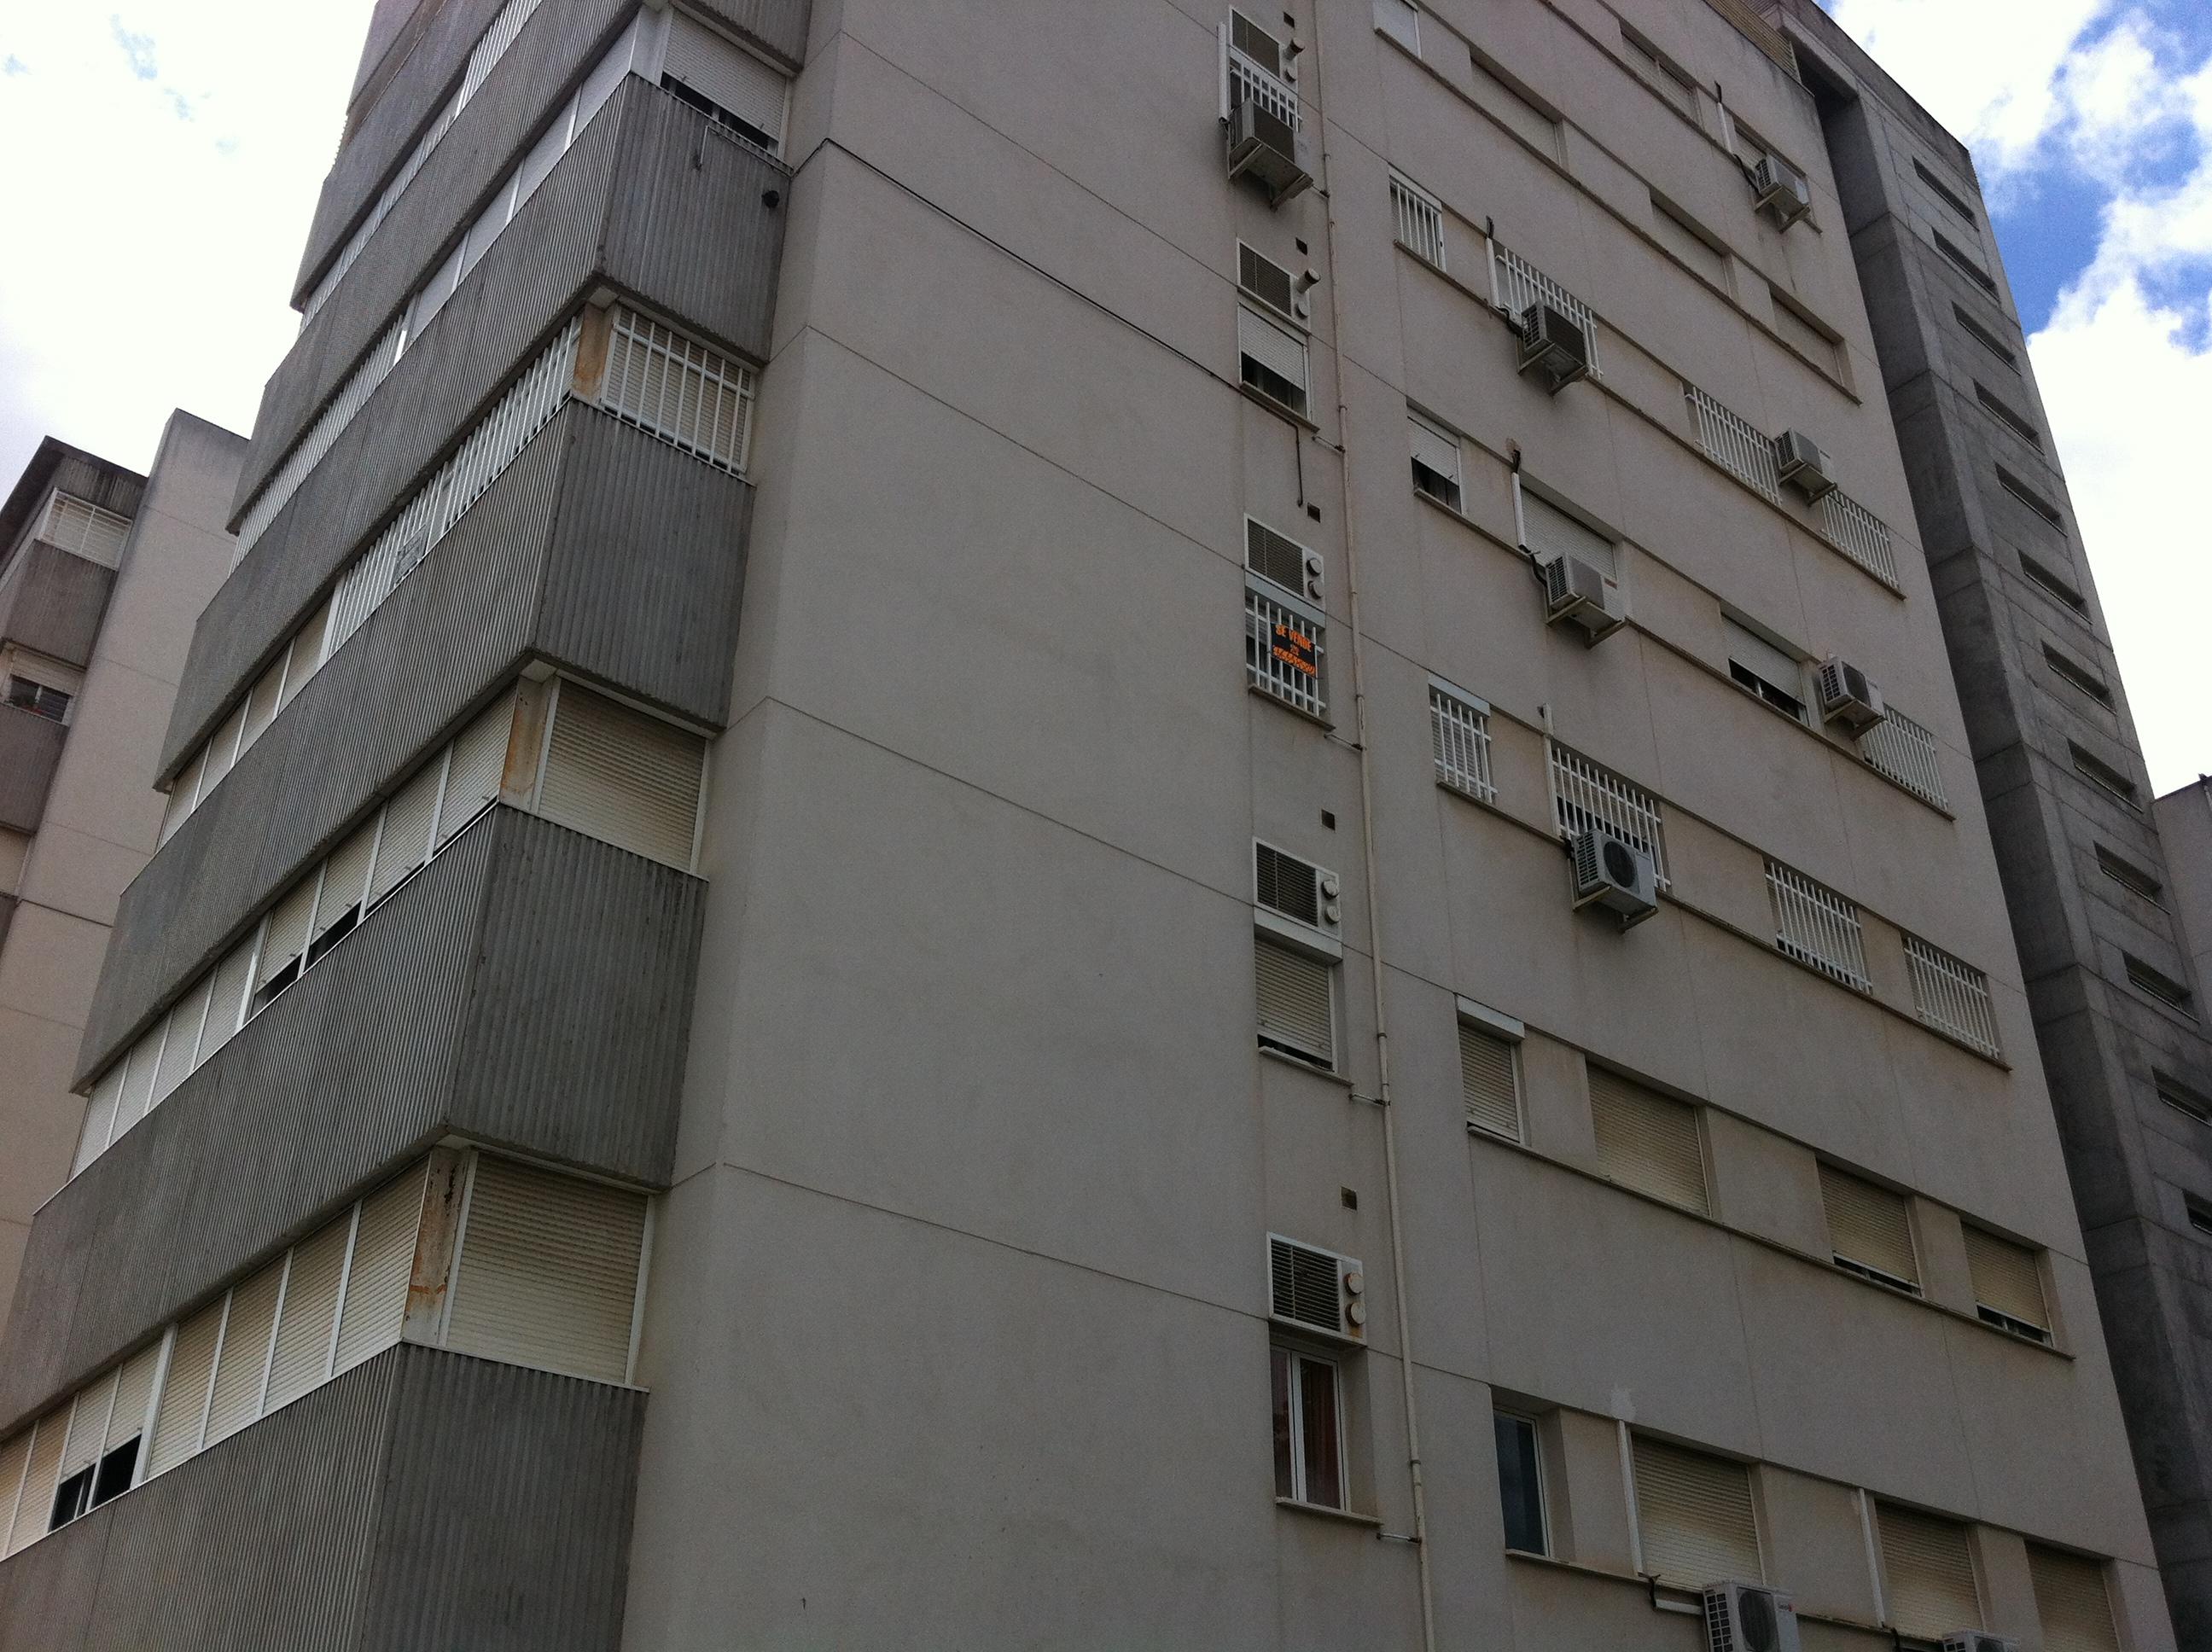 Cee vivienda en bloque flor del tomillo 8 arquitectura - Arquitectura tecnica sevilla ...